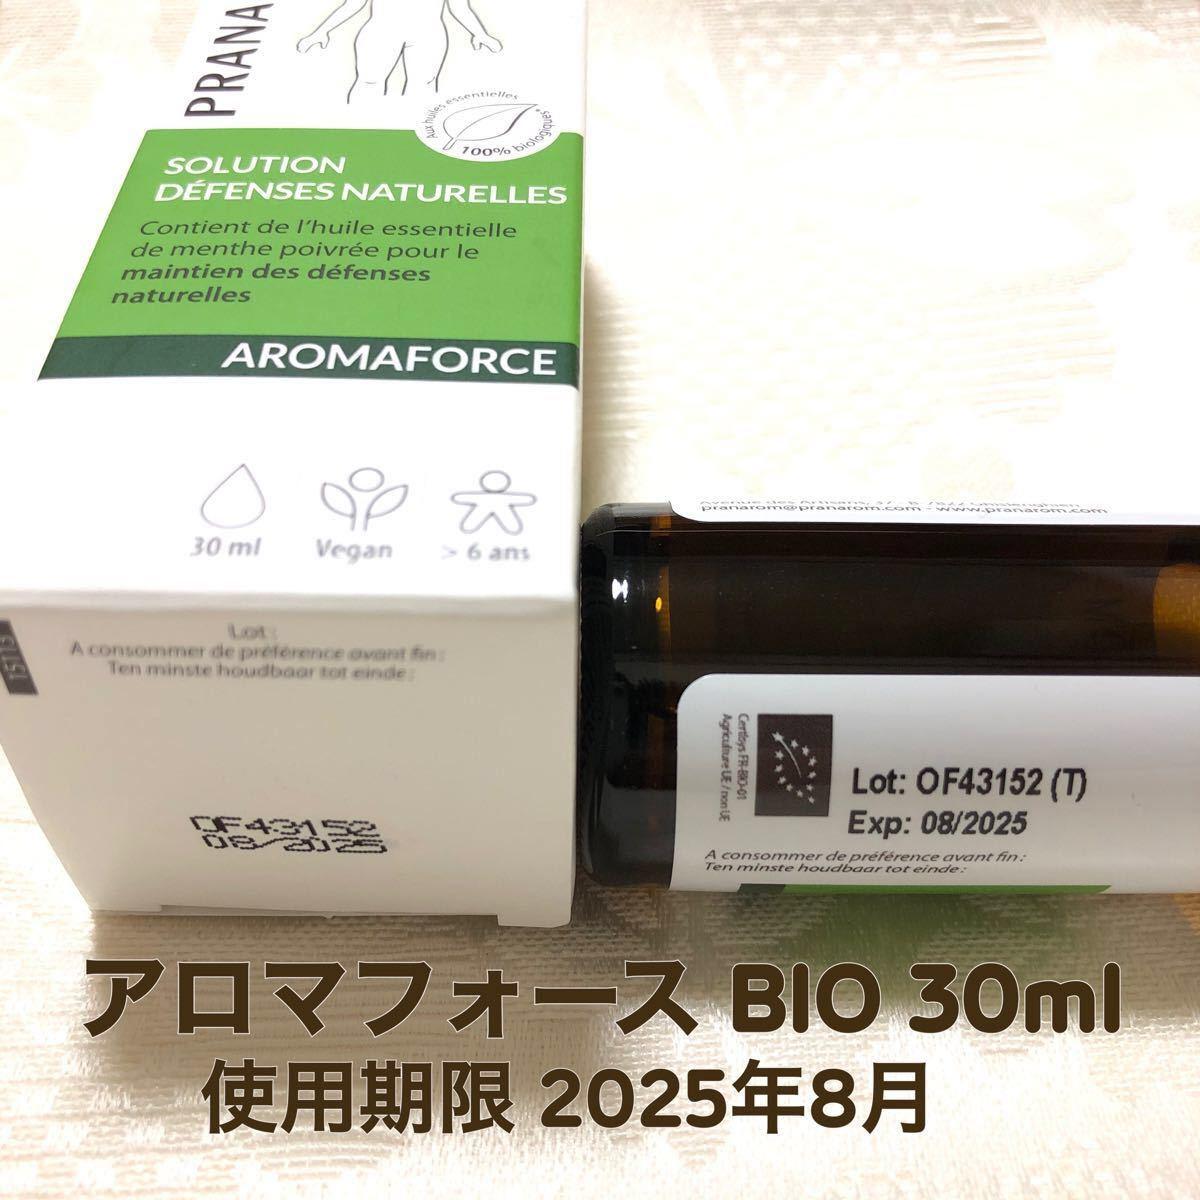 PRANAROM 【アロマフォース 】BIO 30ml プラナロム